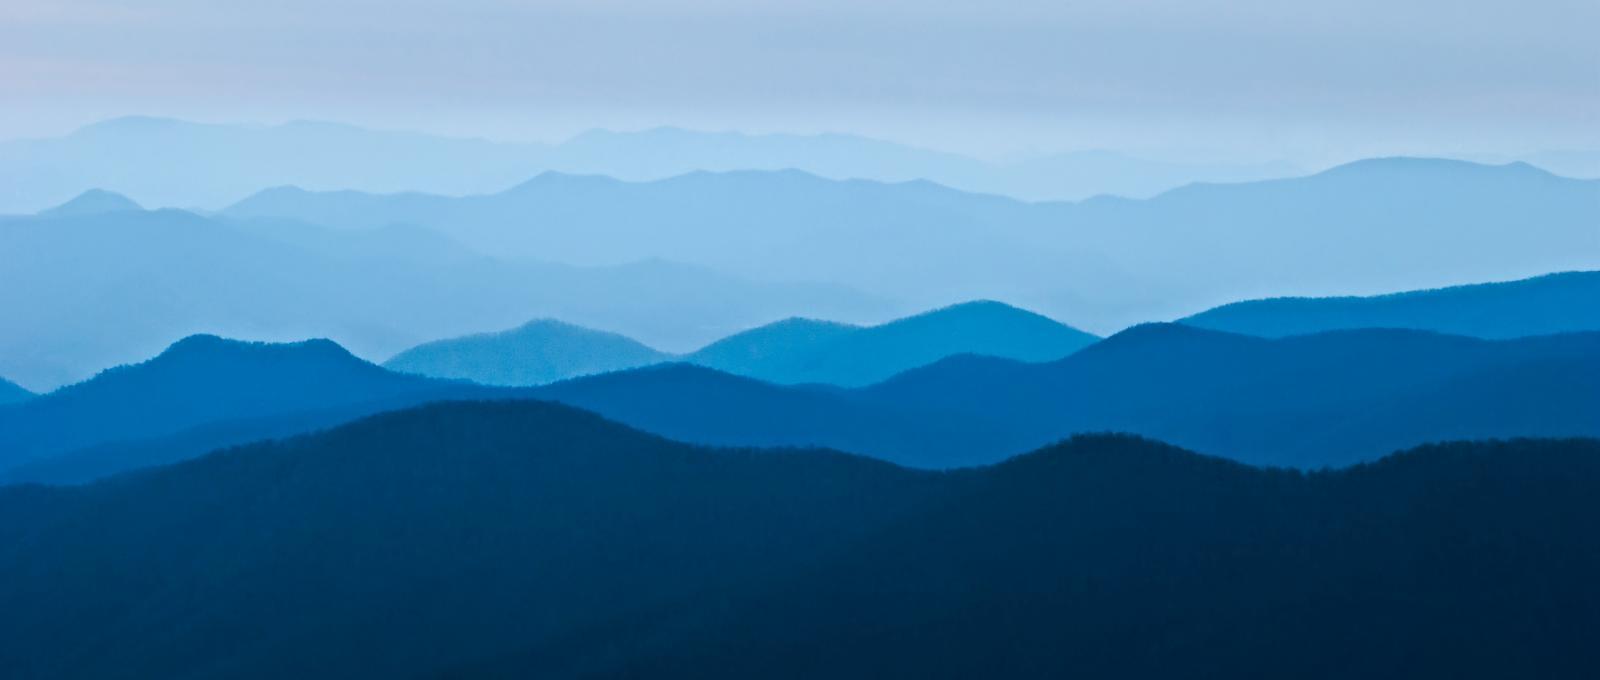 appalachian blue ridge mountains wallpaper - photo #28